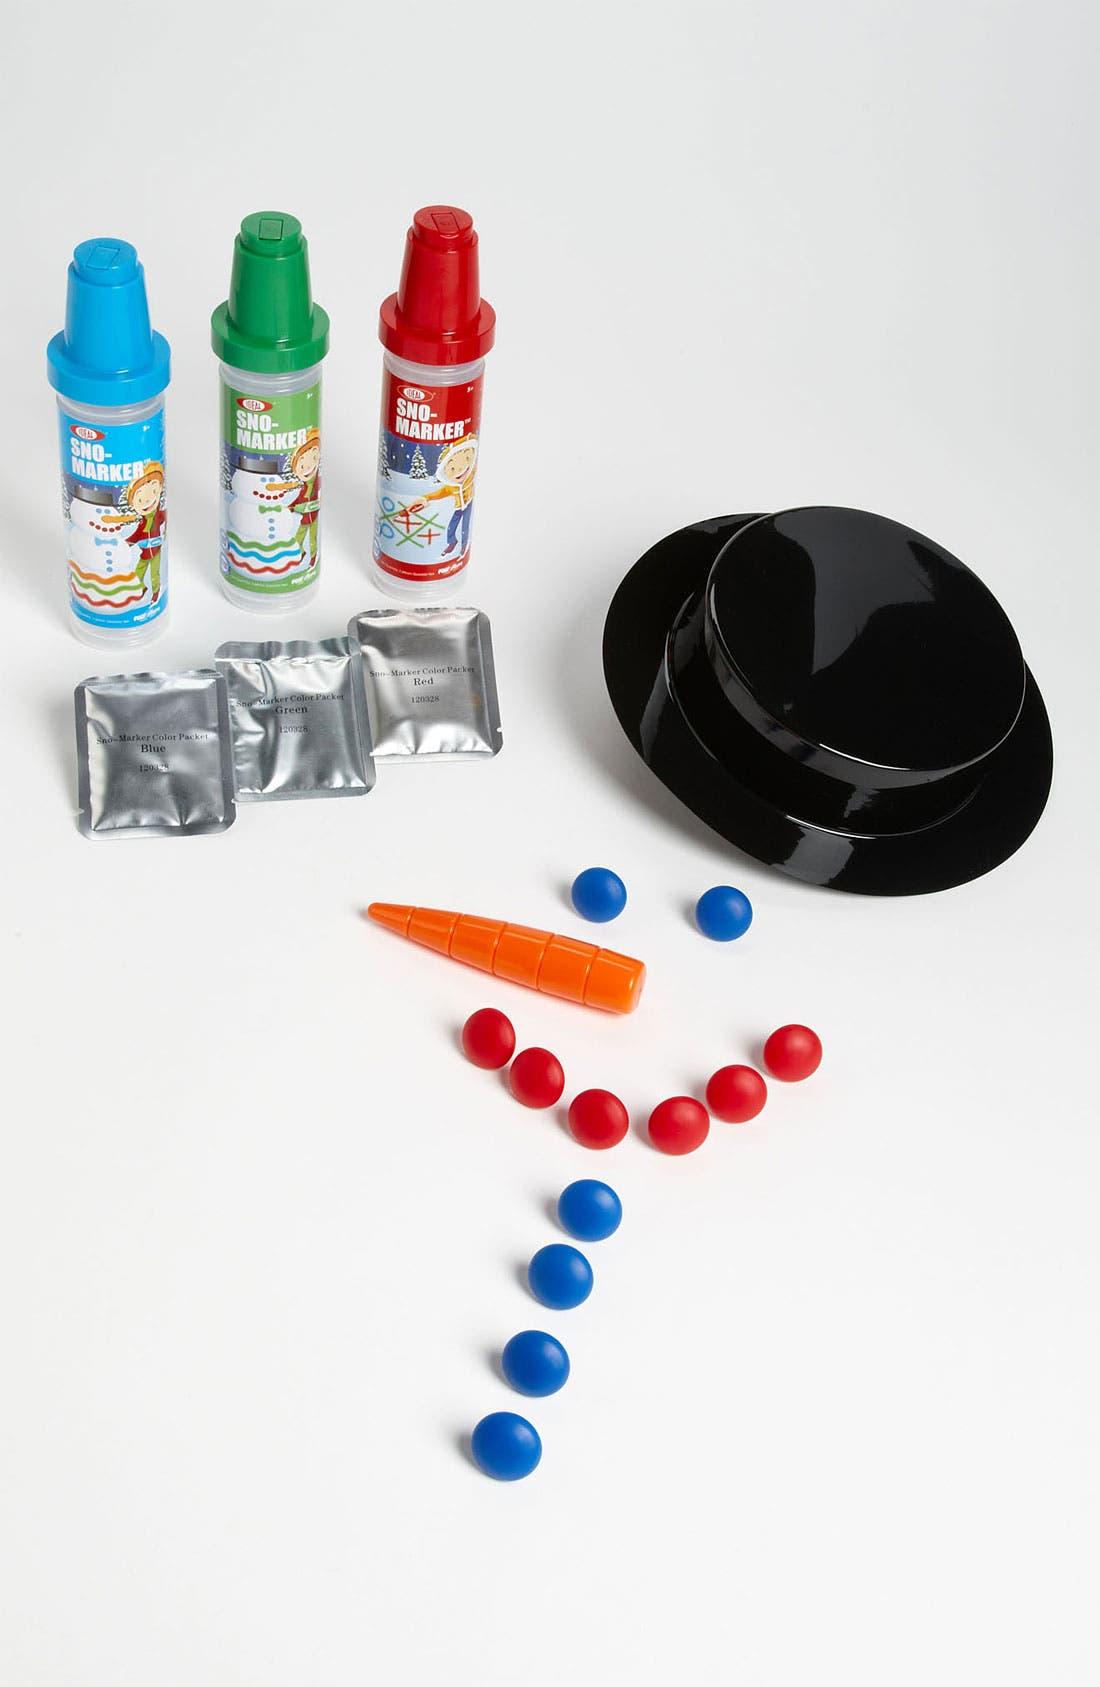 Main Image - Poof-Slinky Snowman Paint Kit